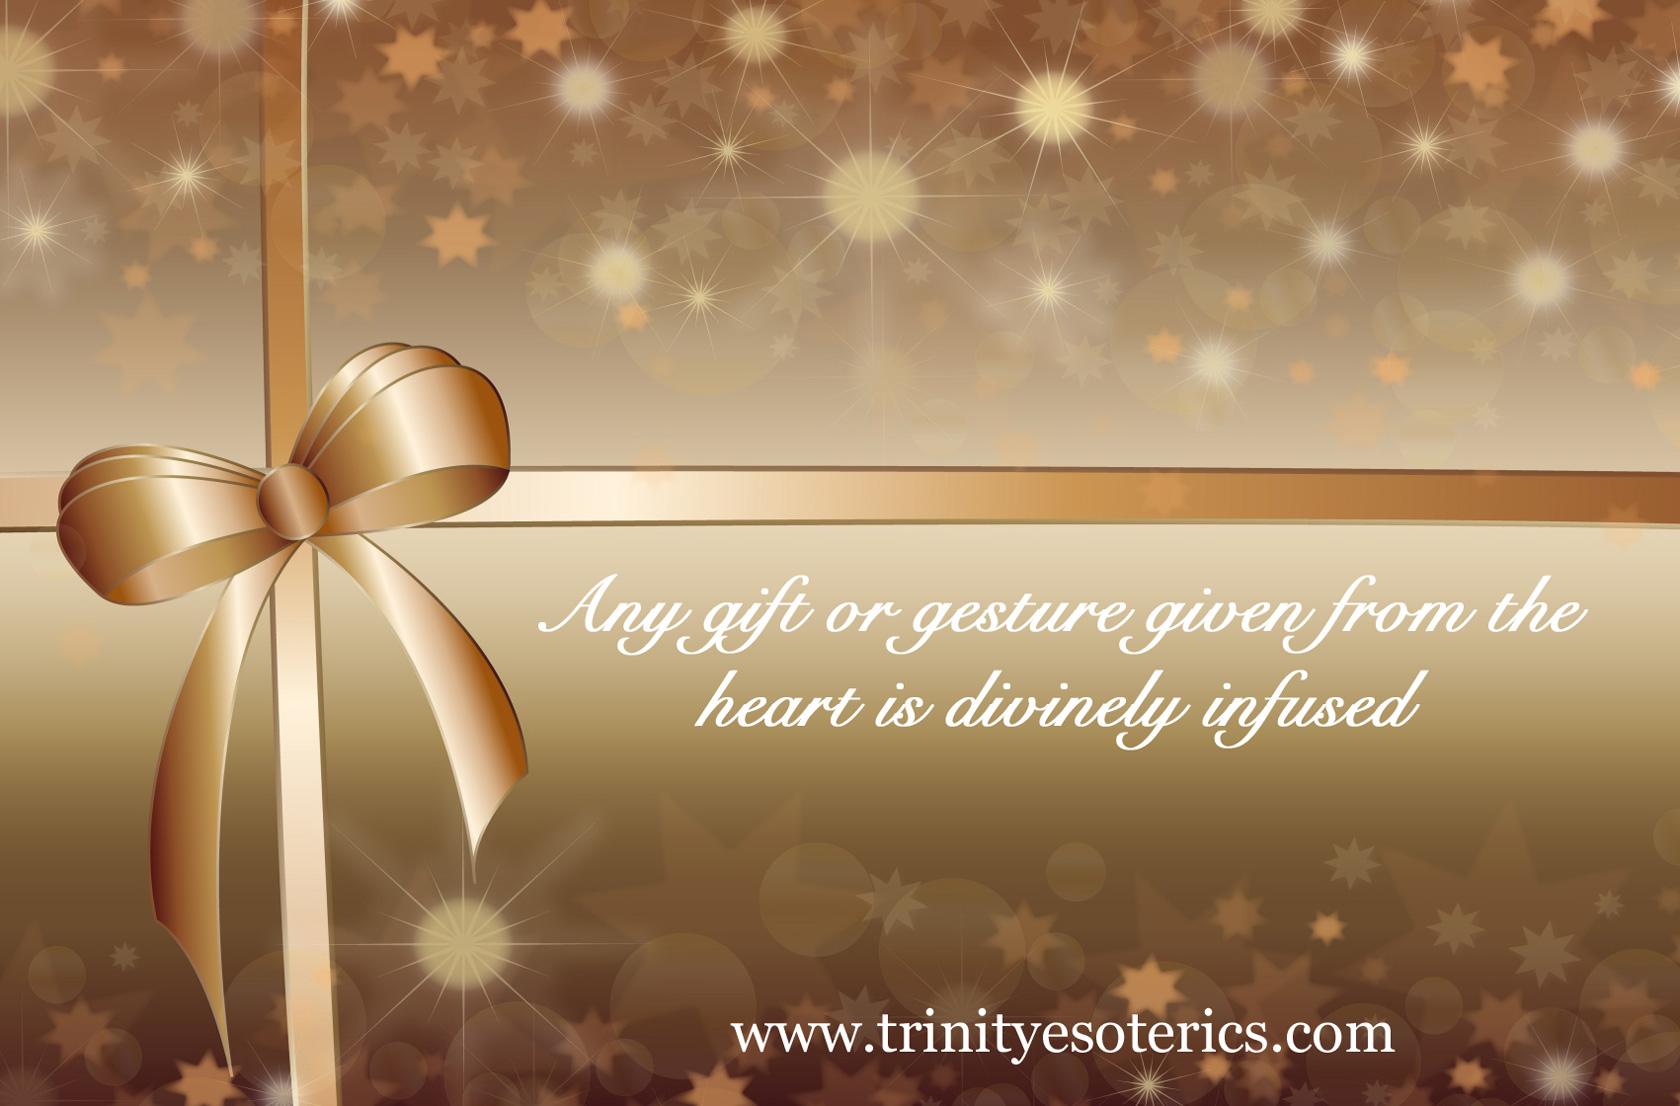 golden present trinity esoterics